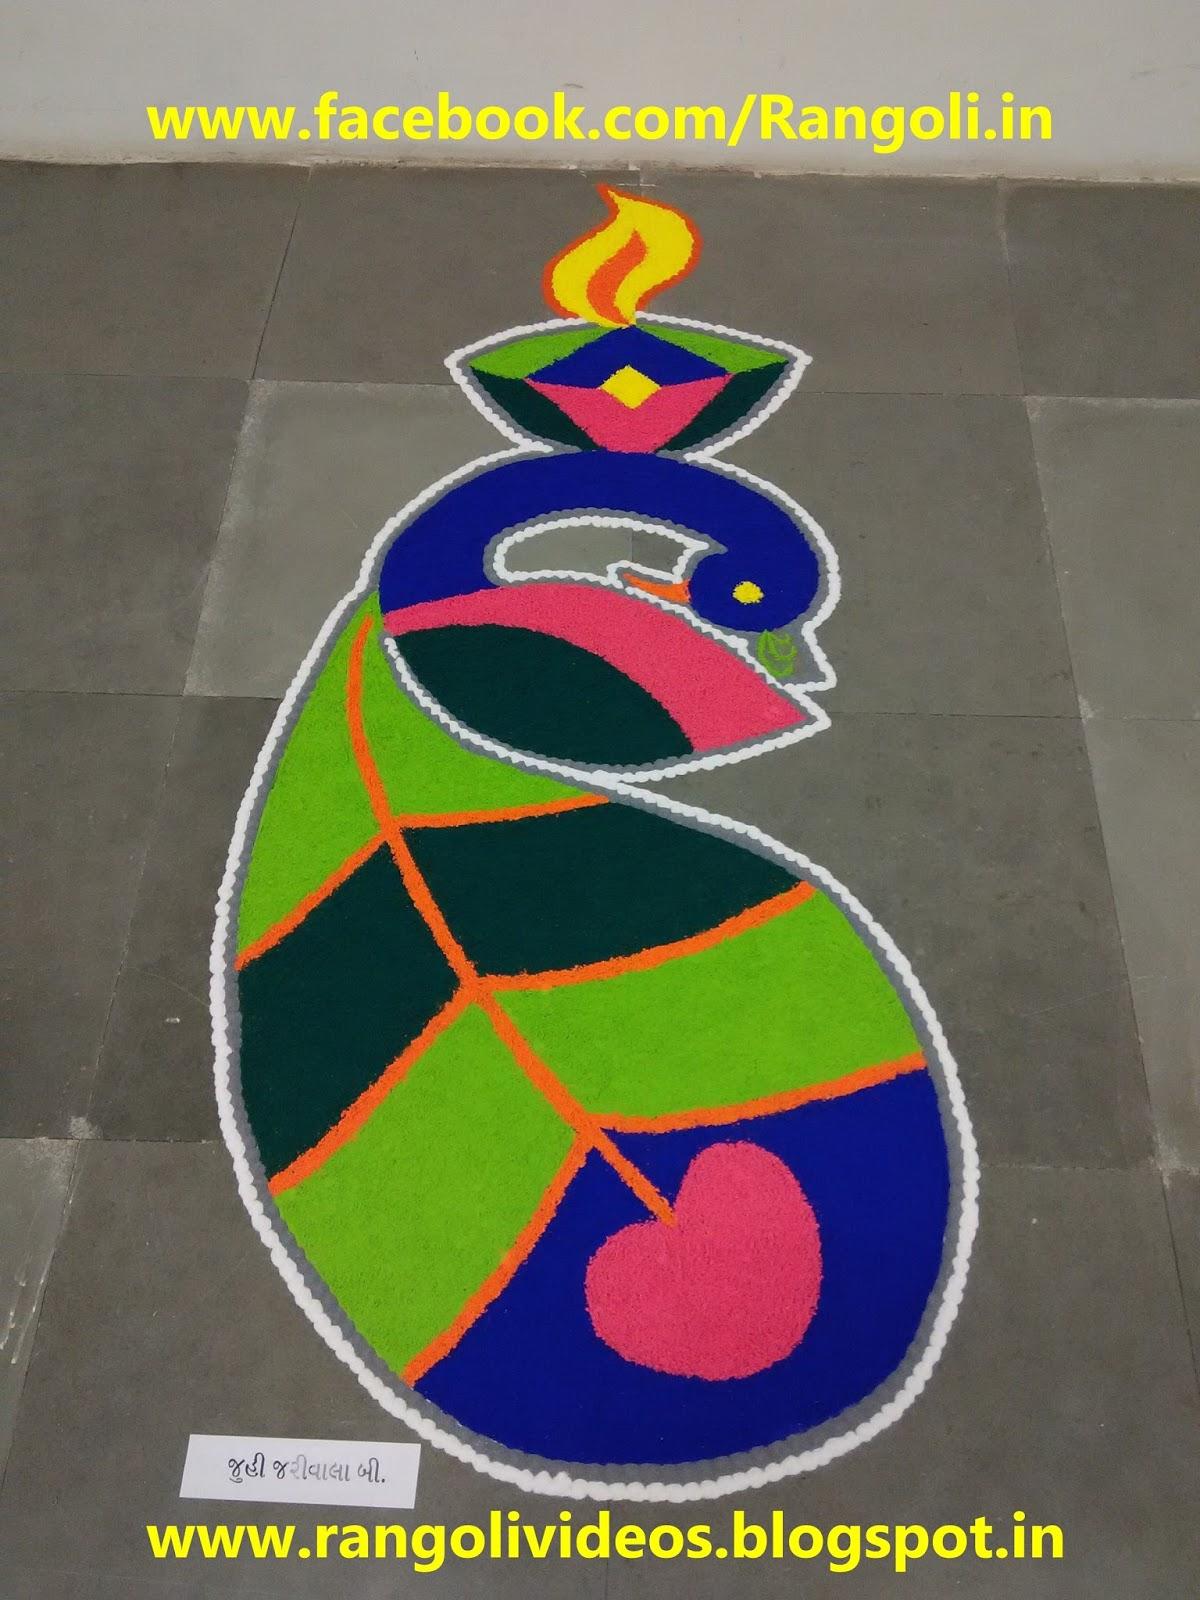 diwali rangoli kolam designs images margazhi rangoli